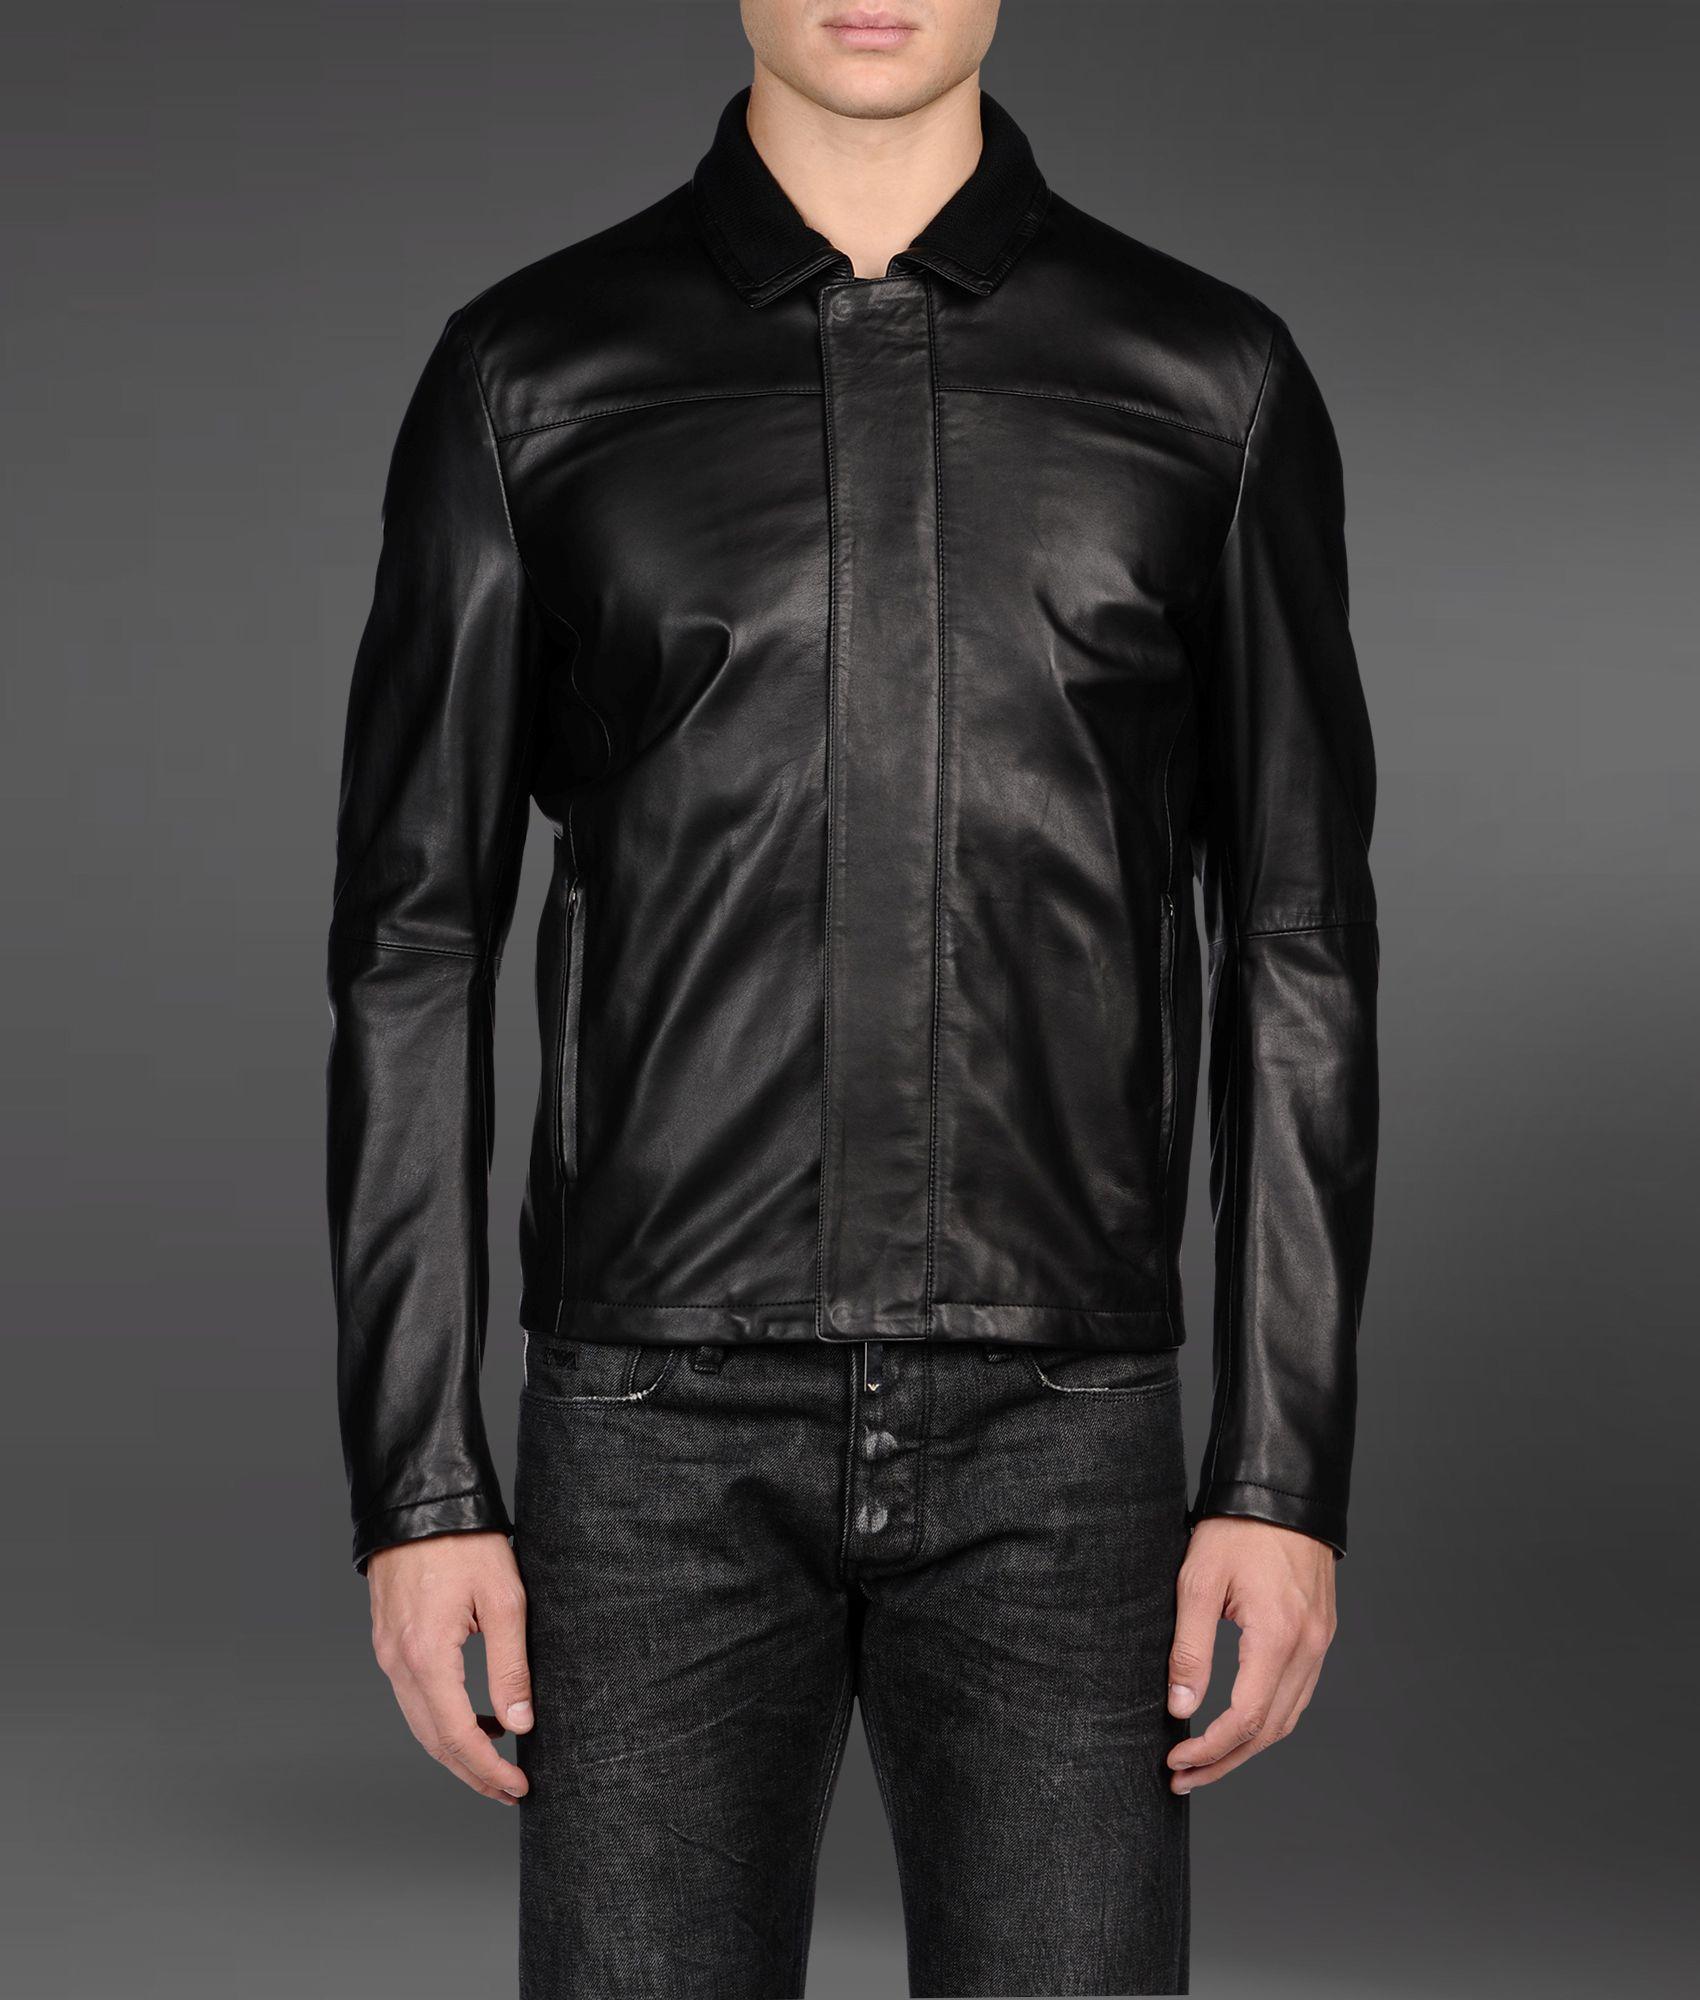 Emporio leather jackets